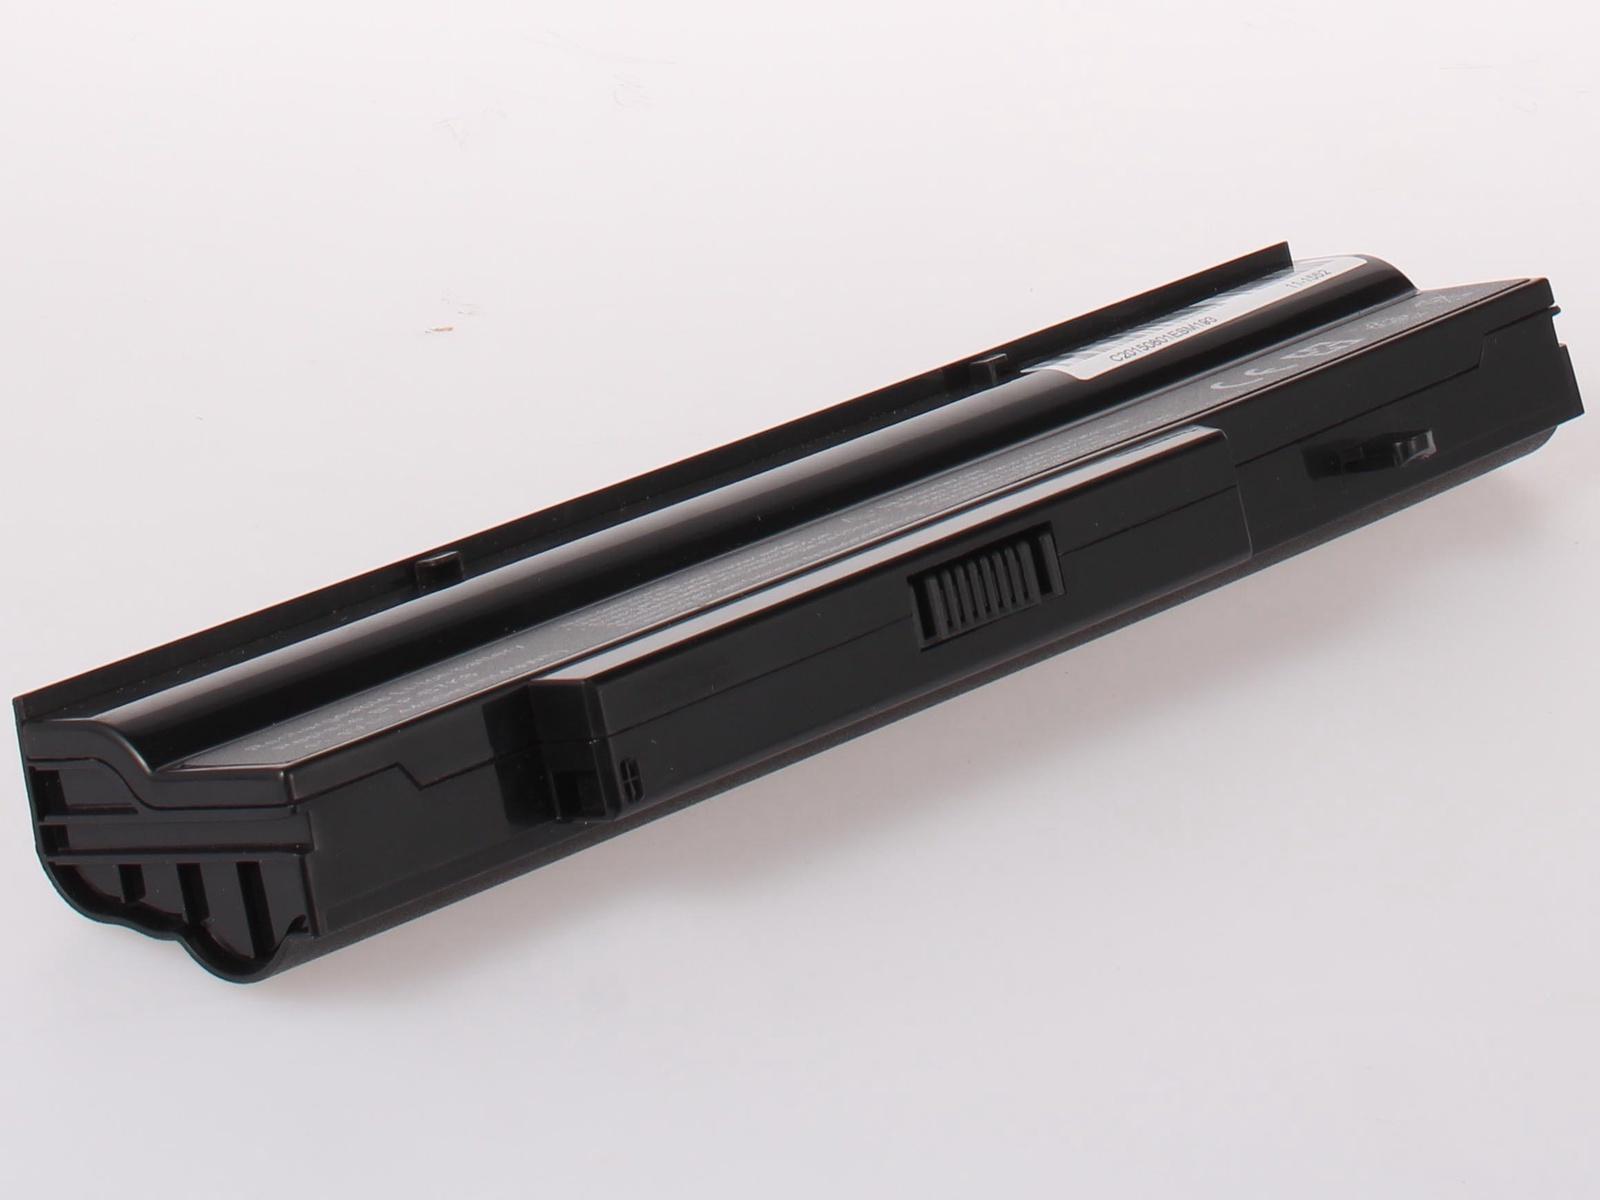 Аккумулятор для ноутбука AnyBatt для Fujitsu-Siemens Esprimo Mobile V6505, Esprimo Mobile V6535, Amilo Li 1720, Amilo Pro V3545, Amilo Li 2735, Amilo Li2727, Amilo Li 2732, Amilo Li1720, Amilo Li1718, Amilo Pro V8210